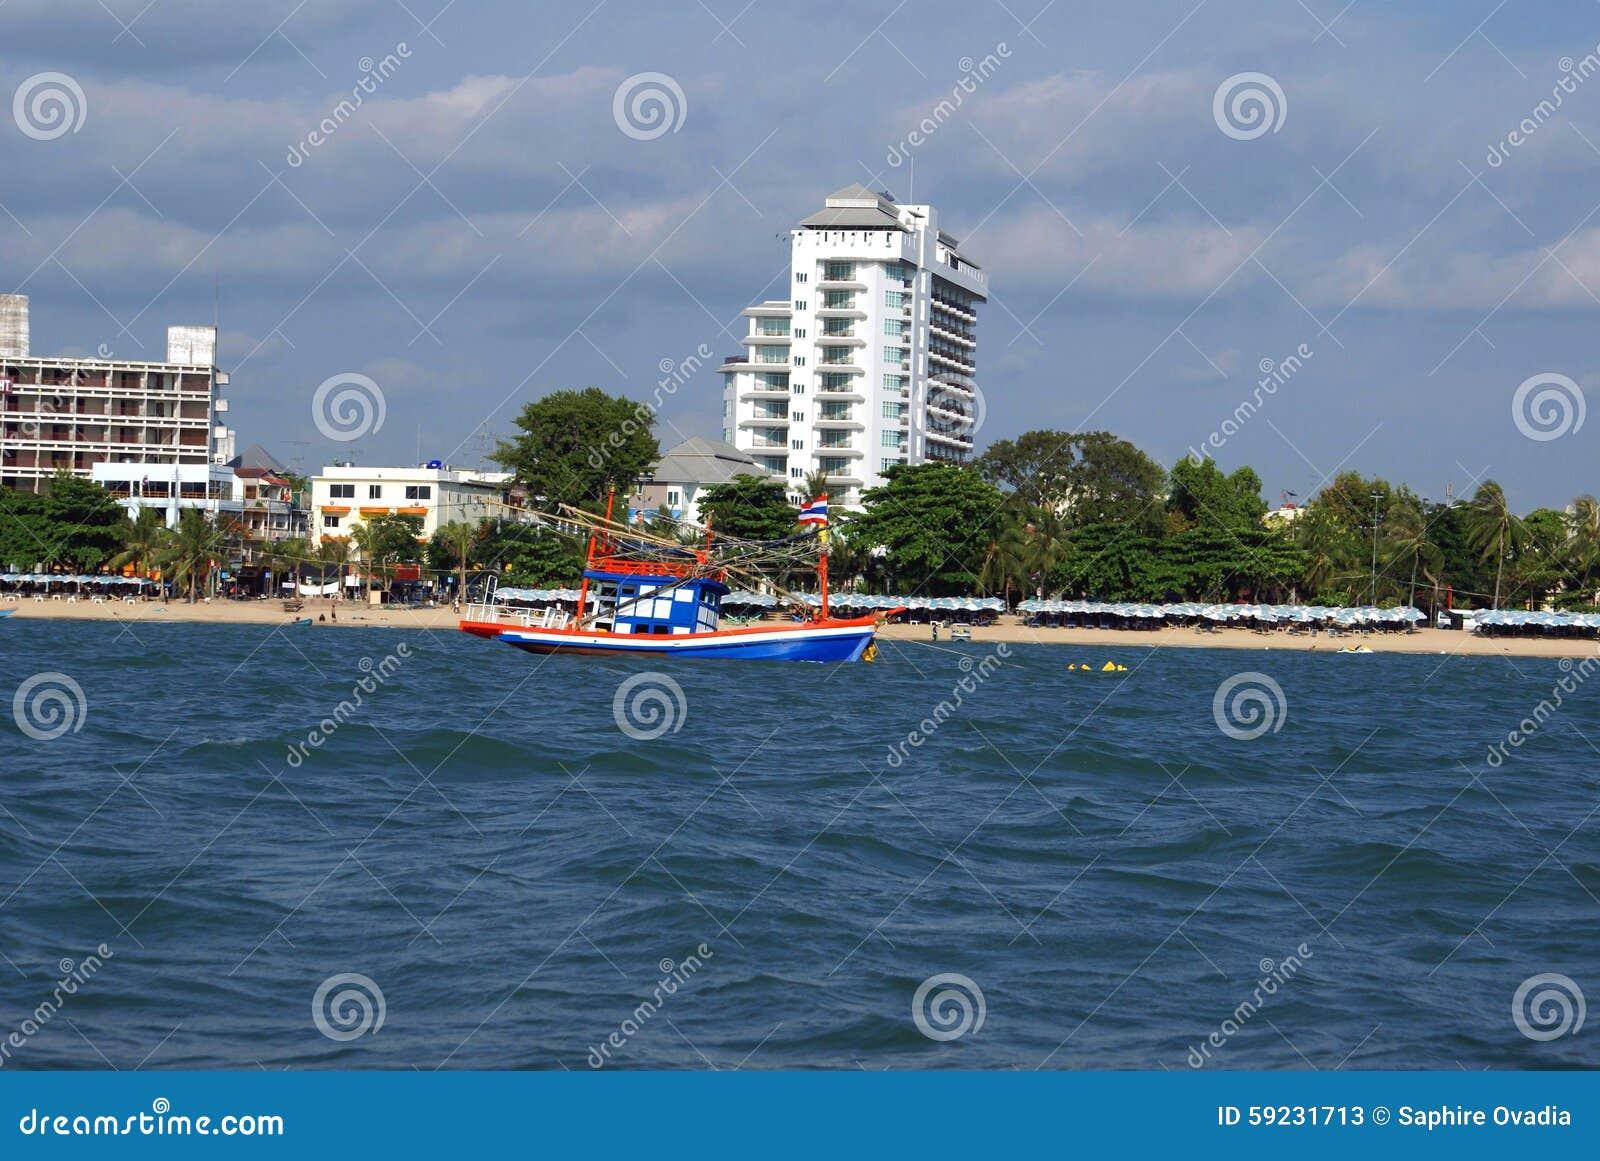 Bali Hai Pattaya Beach en Tailandia, Asia